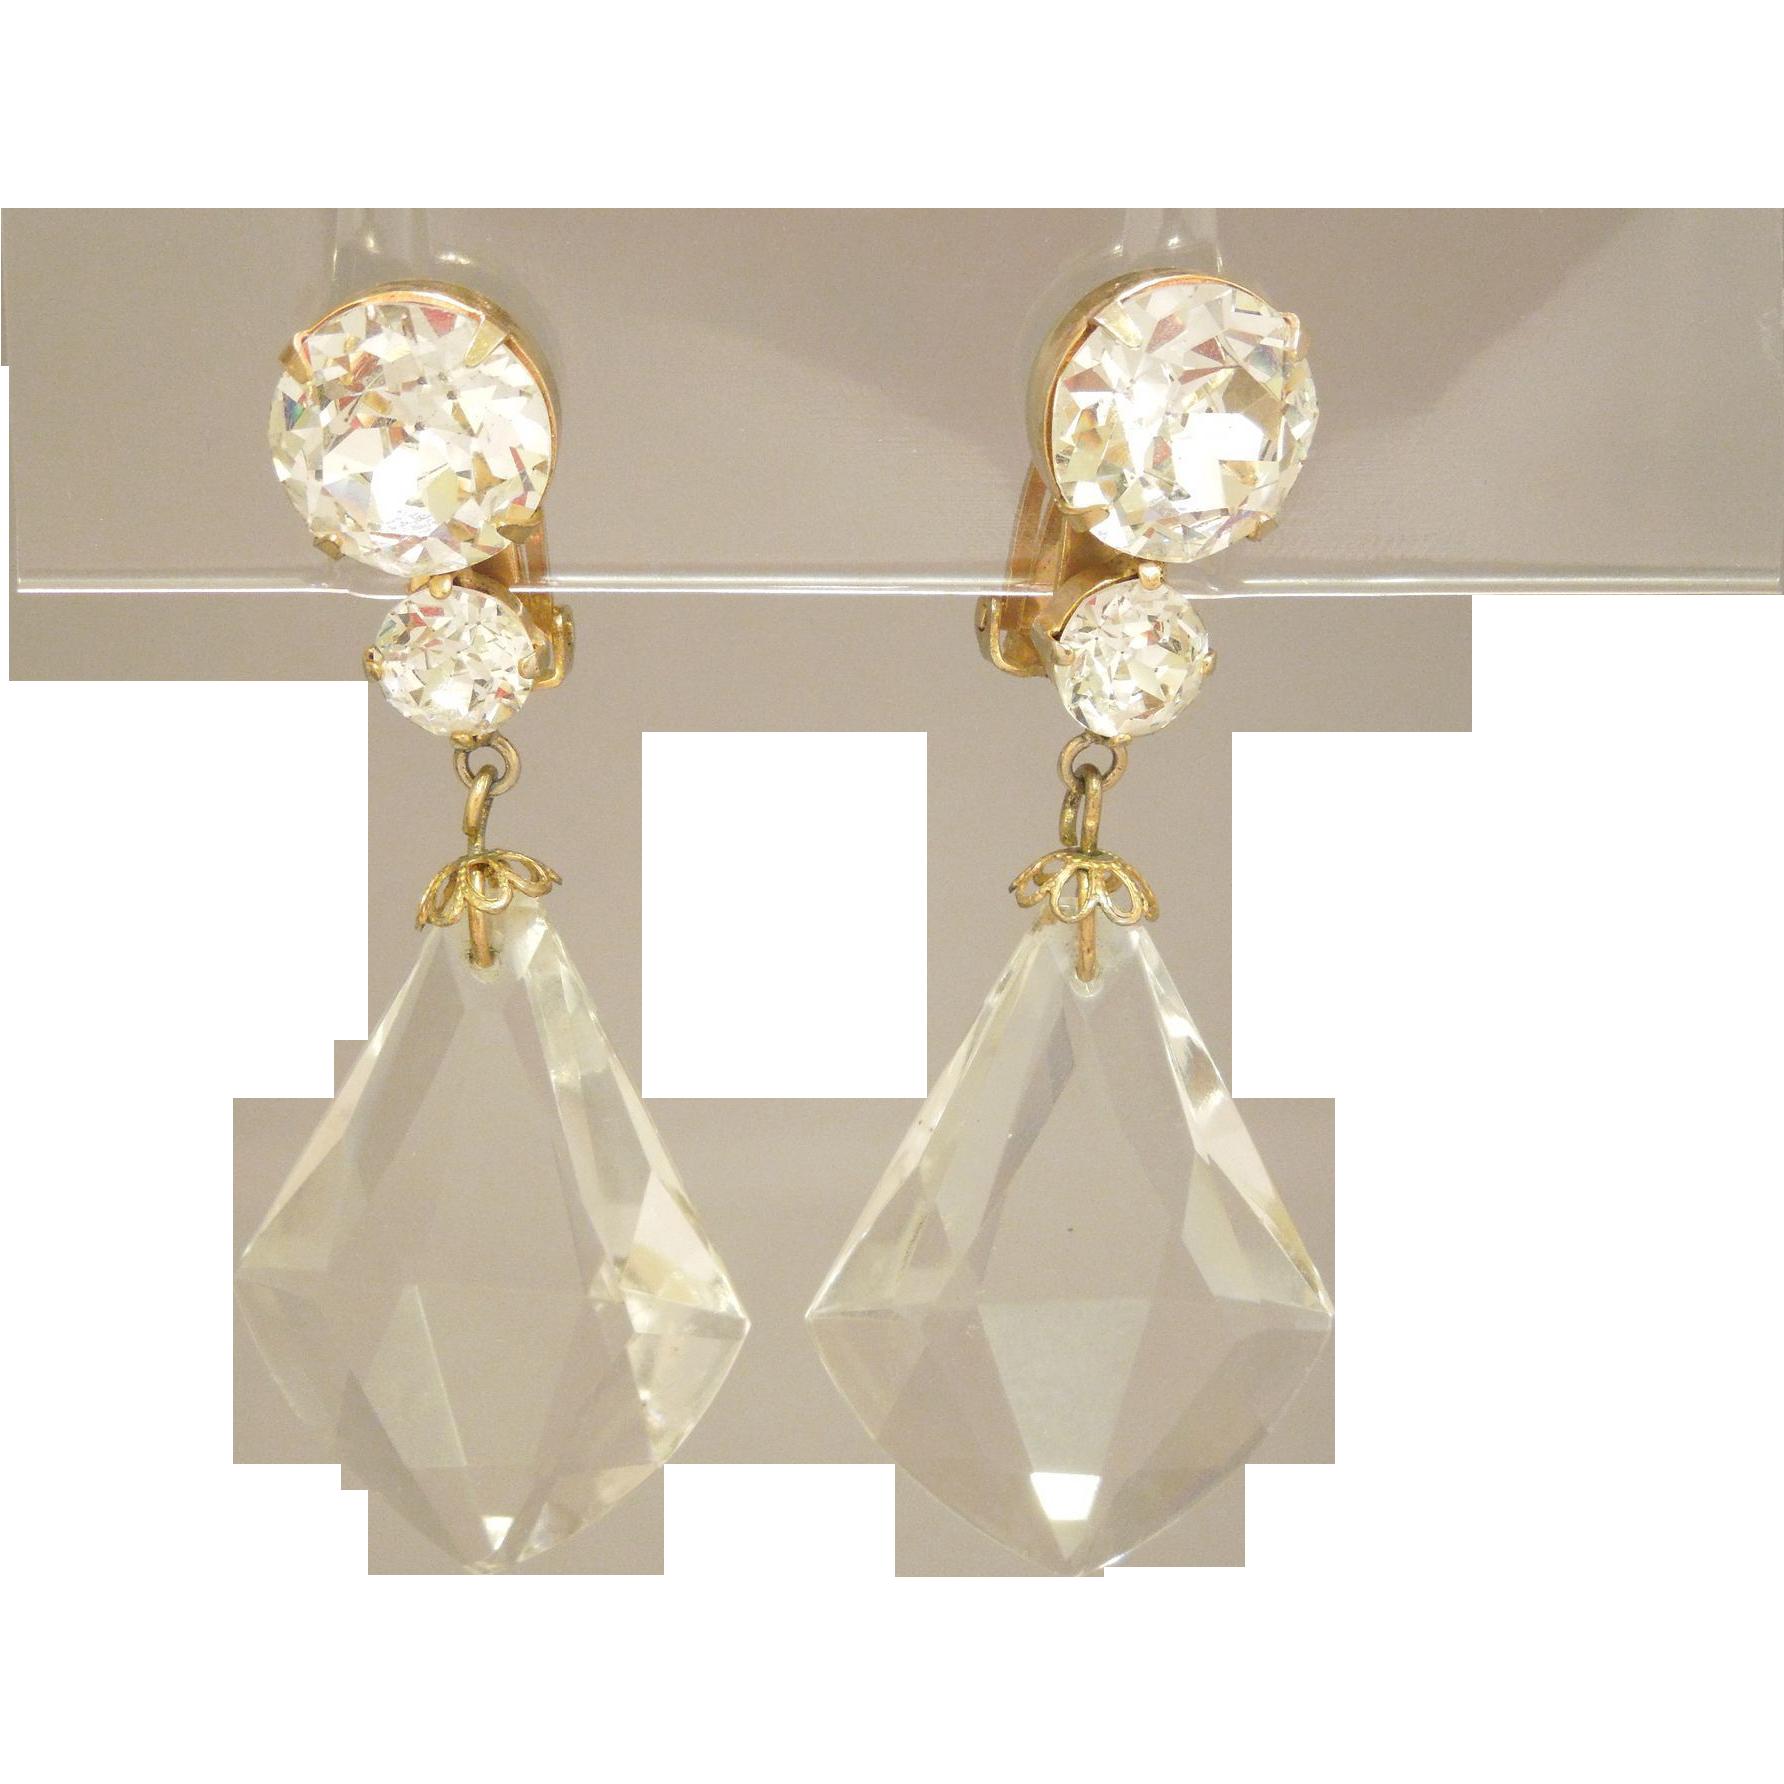 jewelry stores in claremore ok style guru fashion